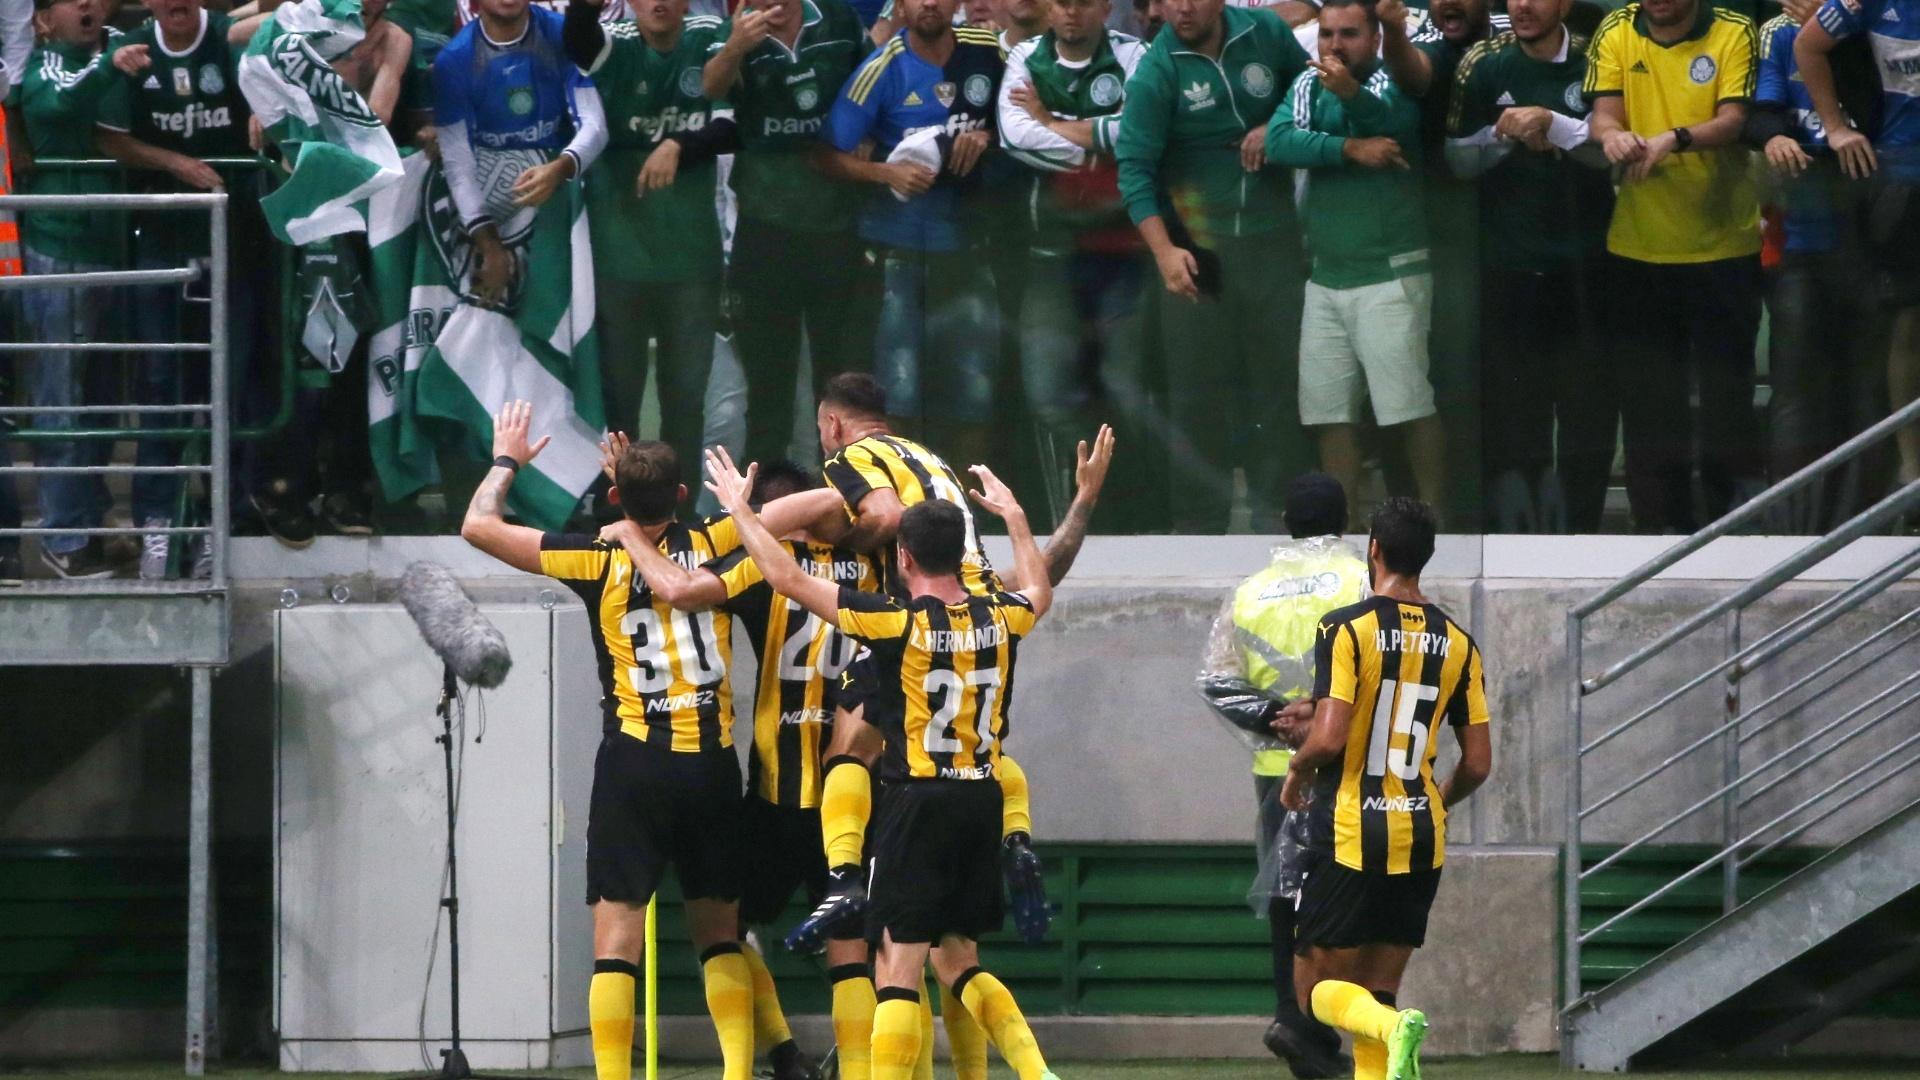 Jogadores do Peñarol comemoram gol contra o Palmeiras na Libertadores